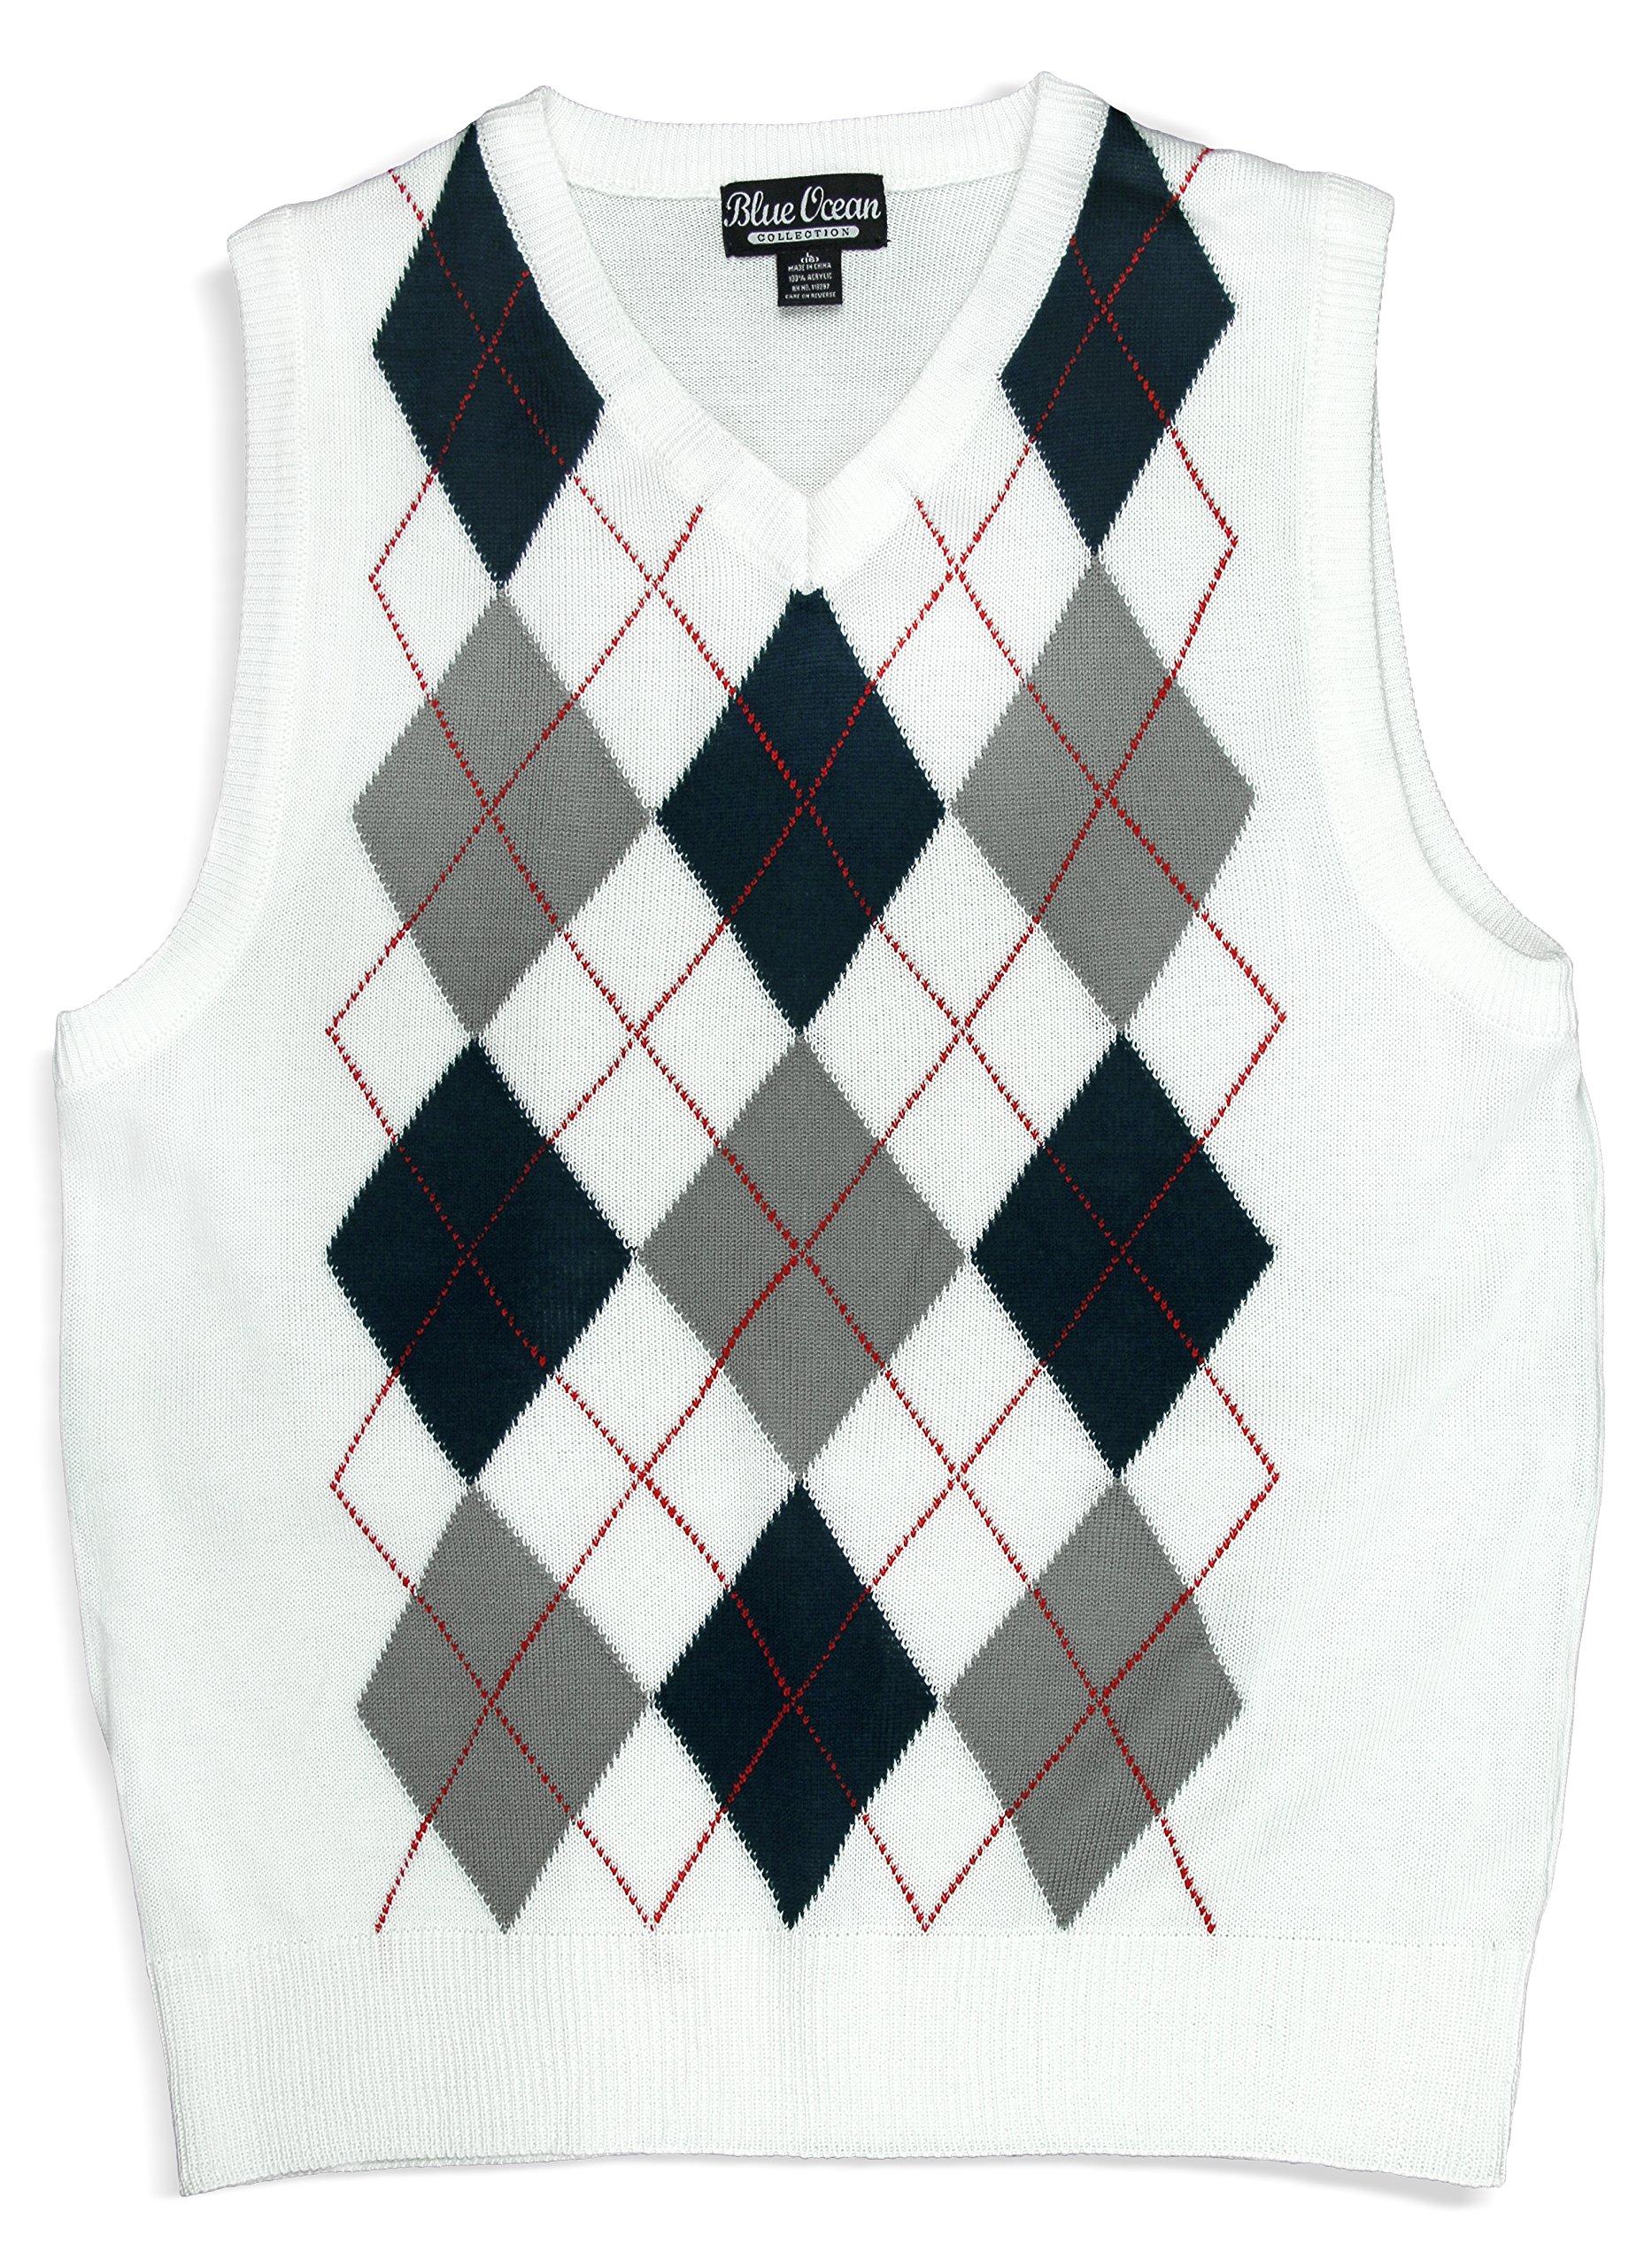 Blue Ocean Kids Argyle Sweater Vest-12-14/Medium